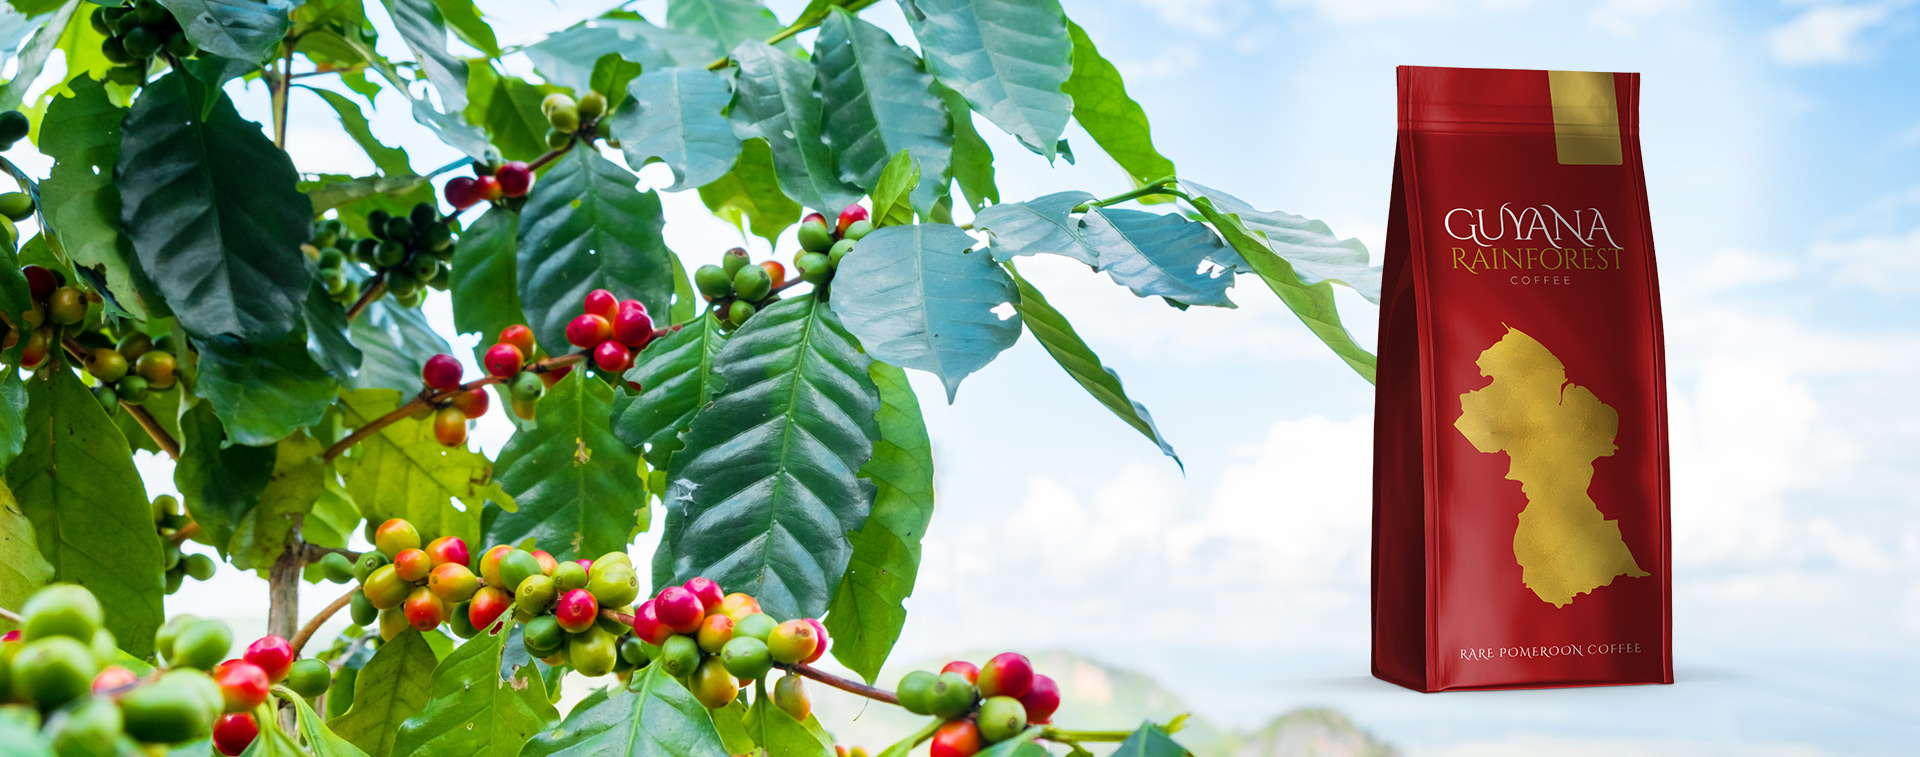 Guyana Rainforest Coffee